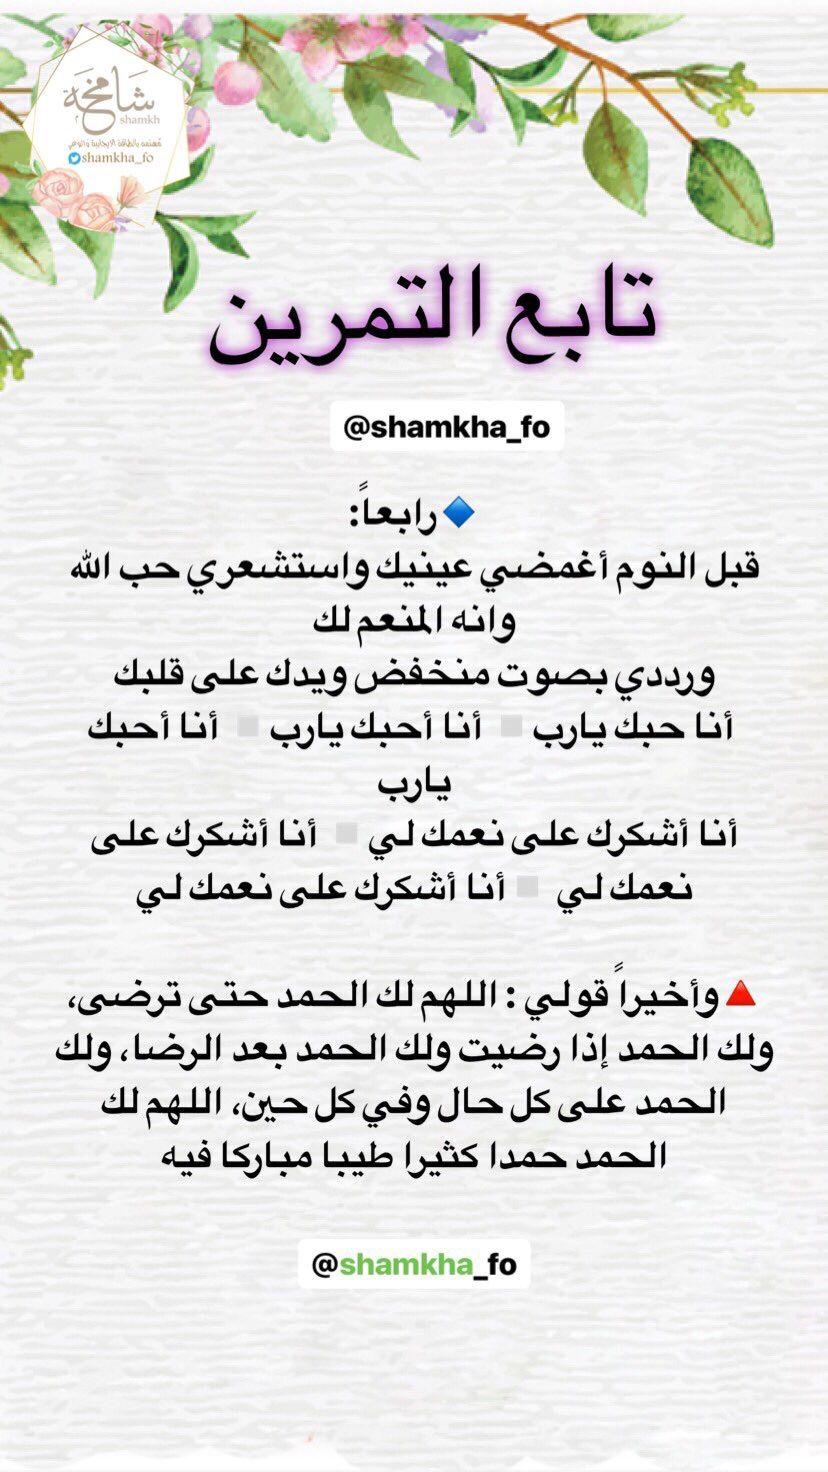 Desertrose أوراد ما قبل النوم وعند الأرق Quran Quotes Love Islamic Phrases Islamic Inspirational Quotes